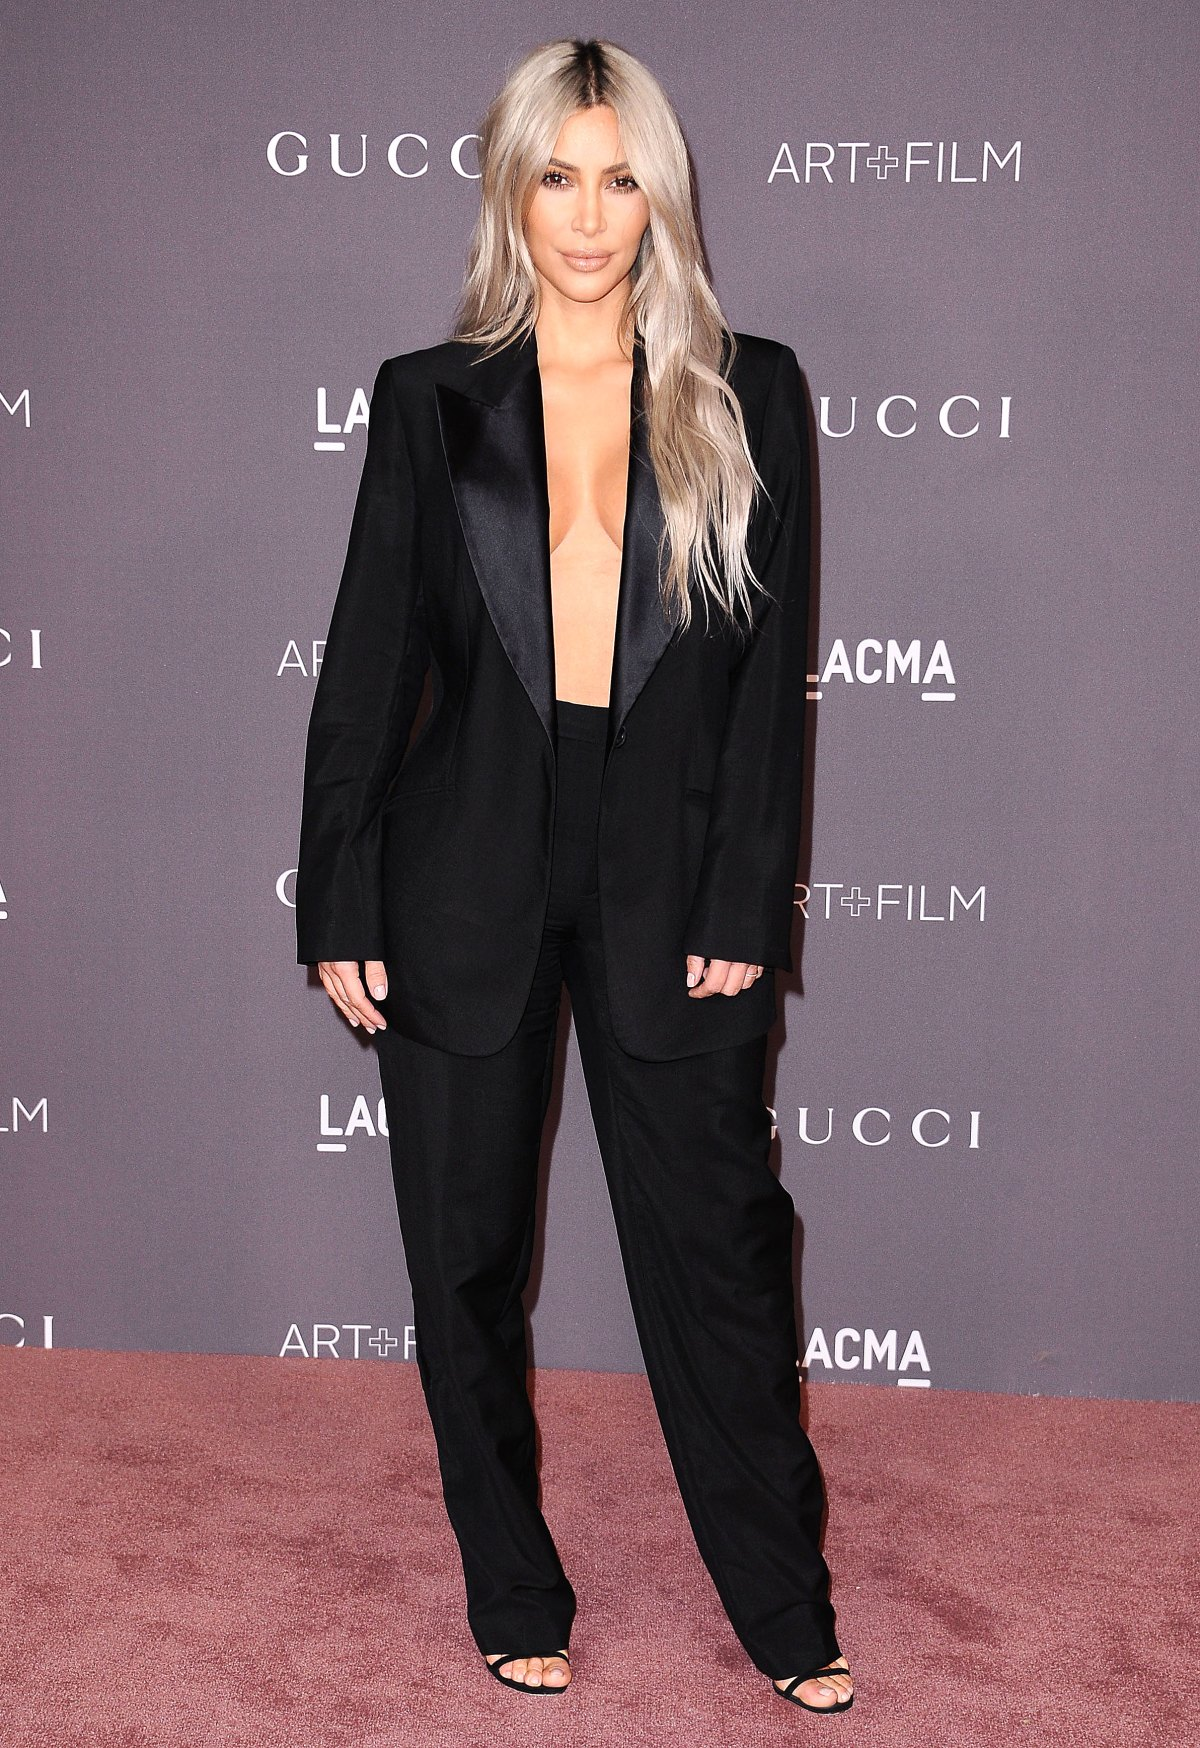 a3b8e5eaf4 Shirtless Tuxedo Celeb Fashion Trend  Kim Kardashian